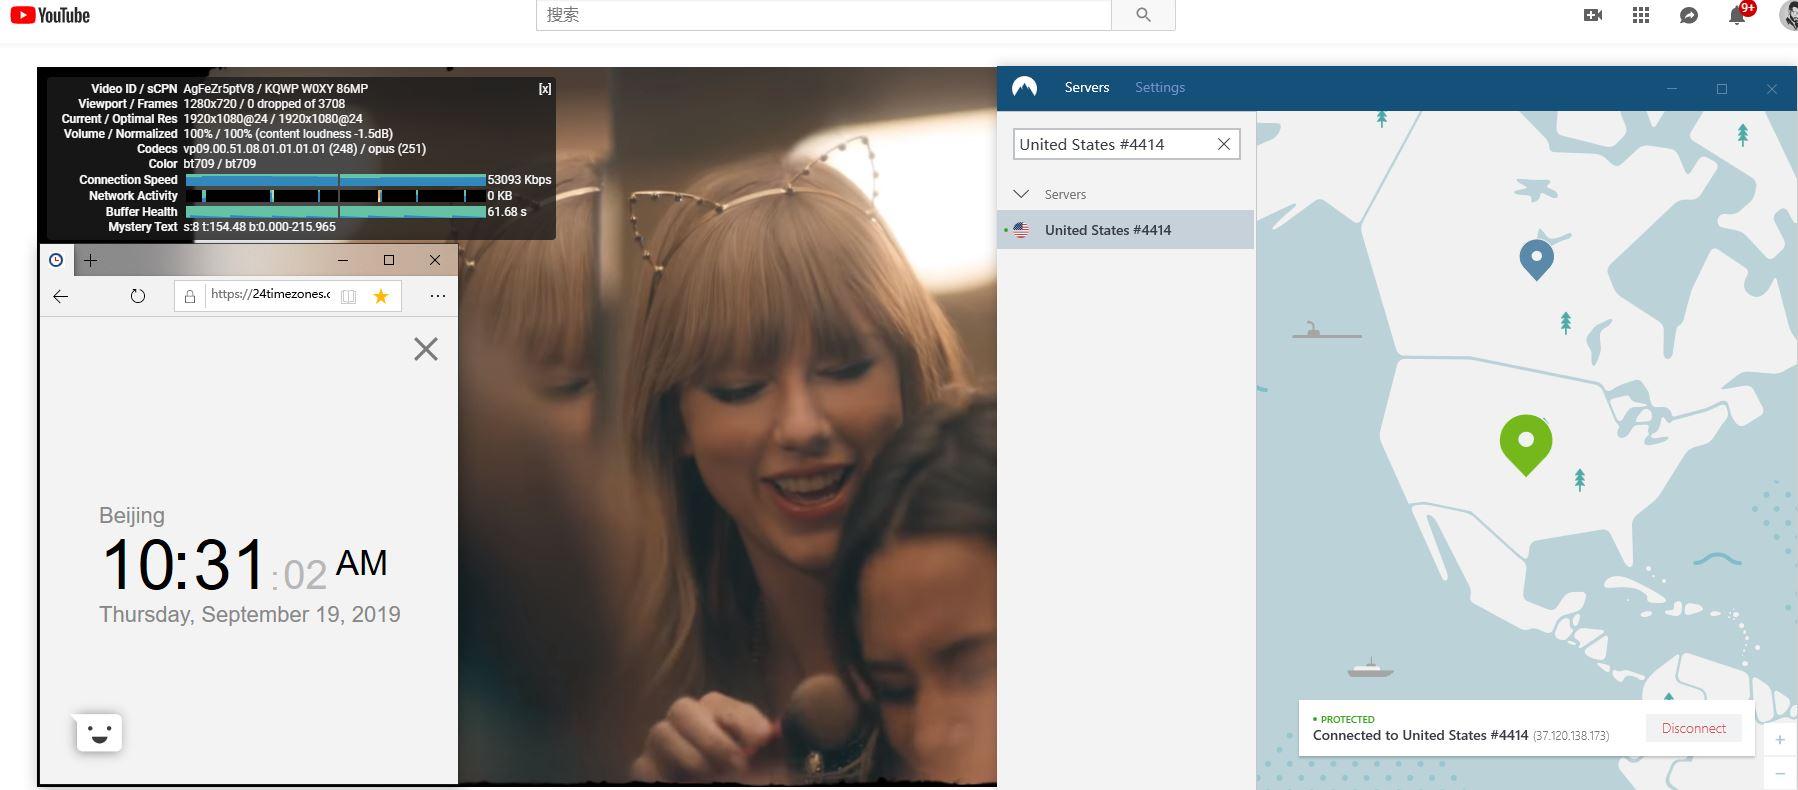 Windows NordVPN USA-4414 服务器 中国VPN翻墙 科学上网 YouTube连接速度-20190919